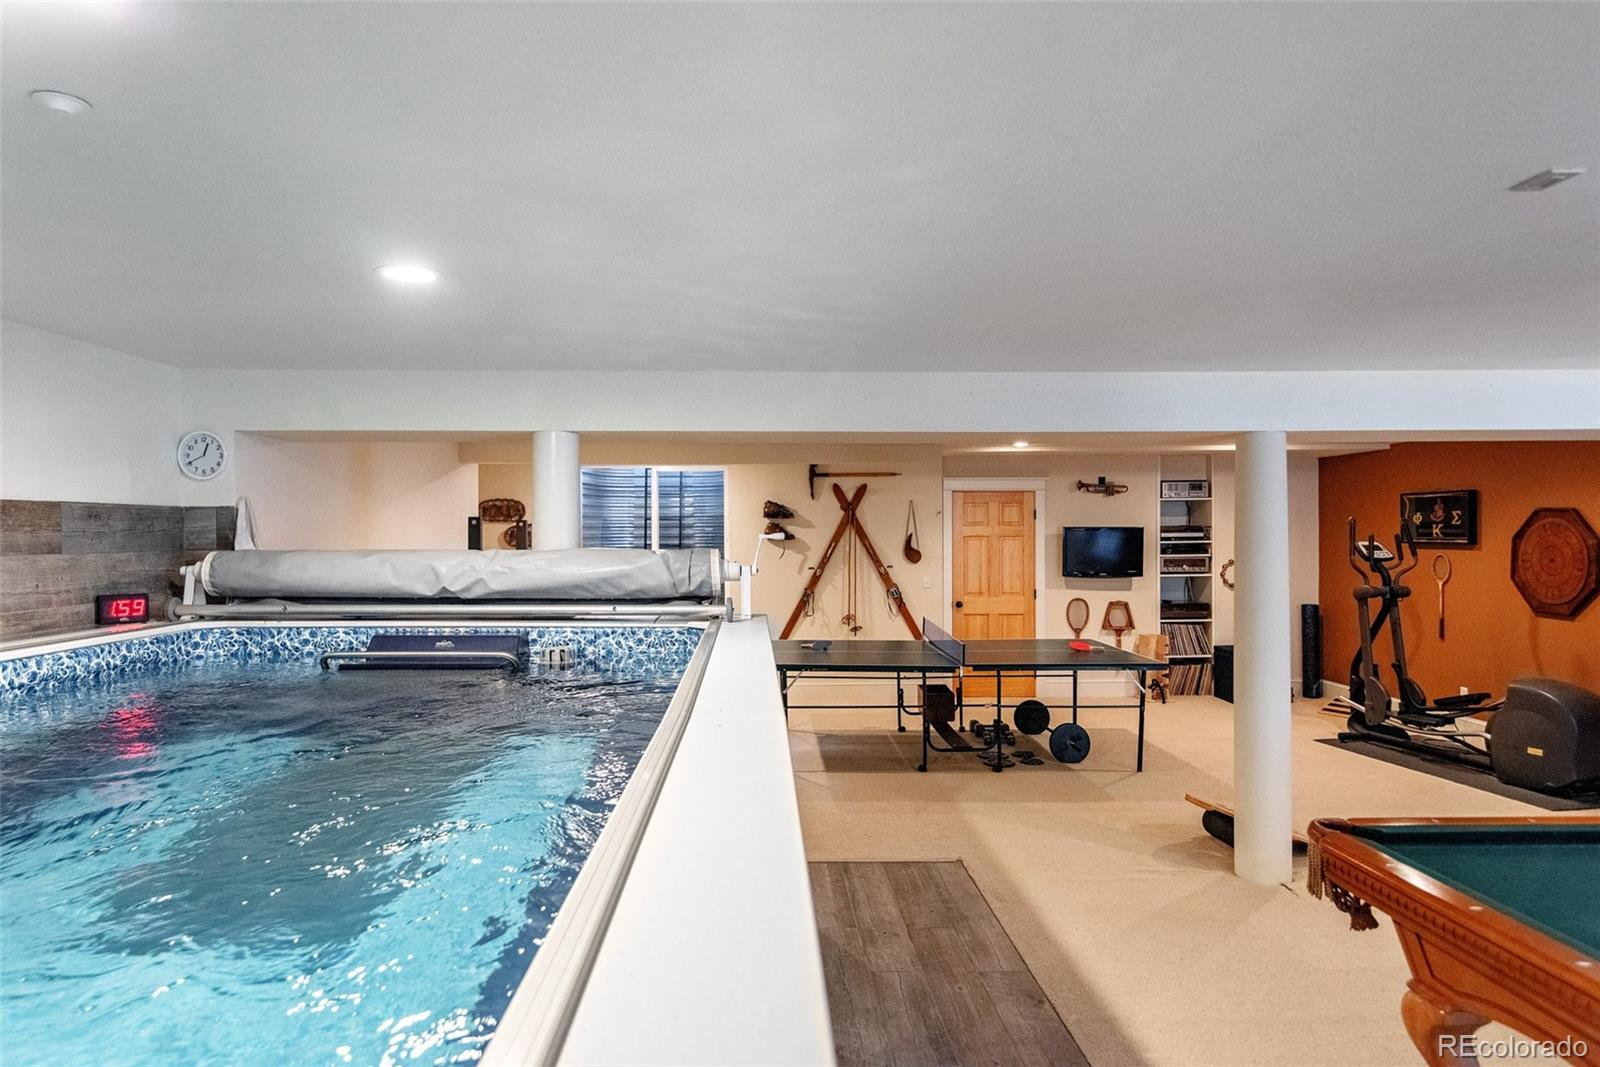 Lap/Therapy Pool